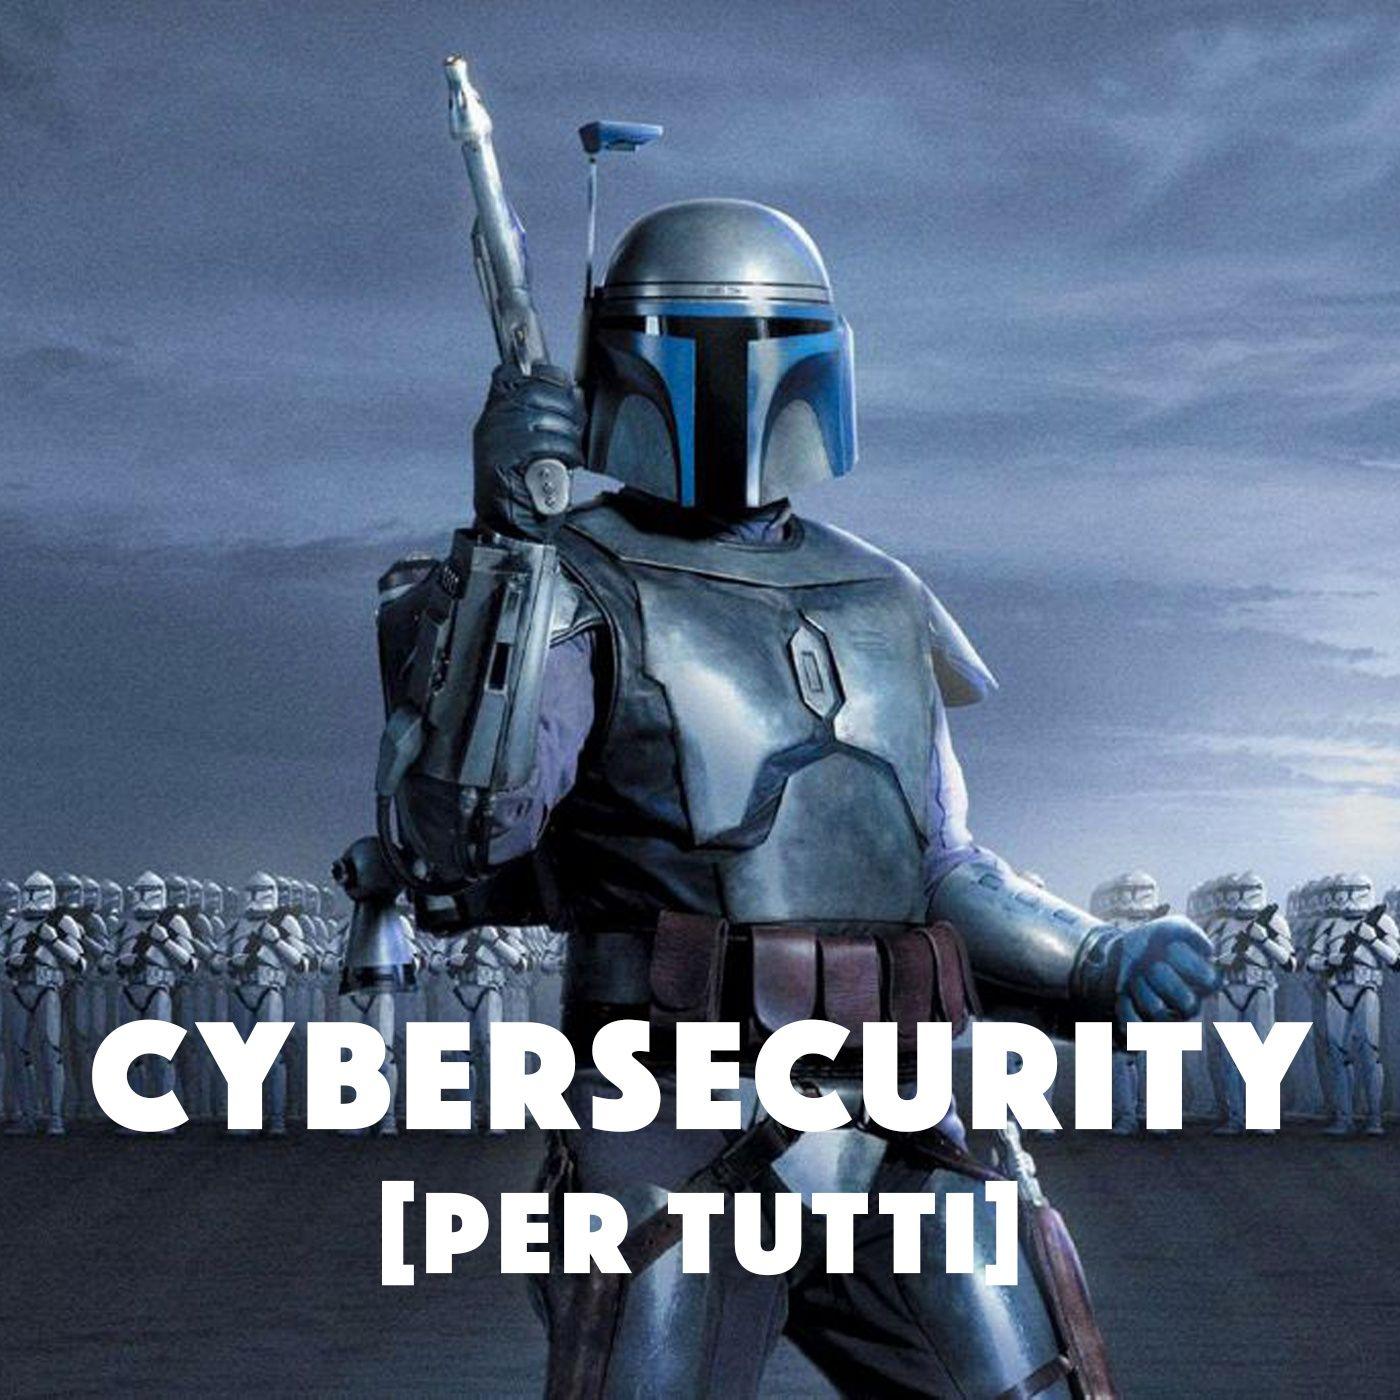 6b46110a846b45c4d42321f820628758 5 nuovi Podcast italiani di Tecnologia